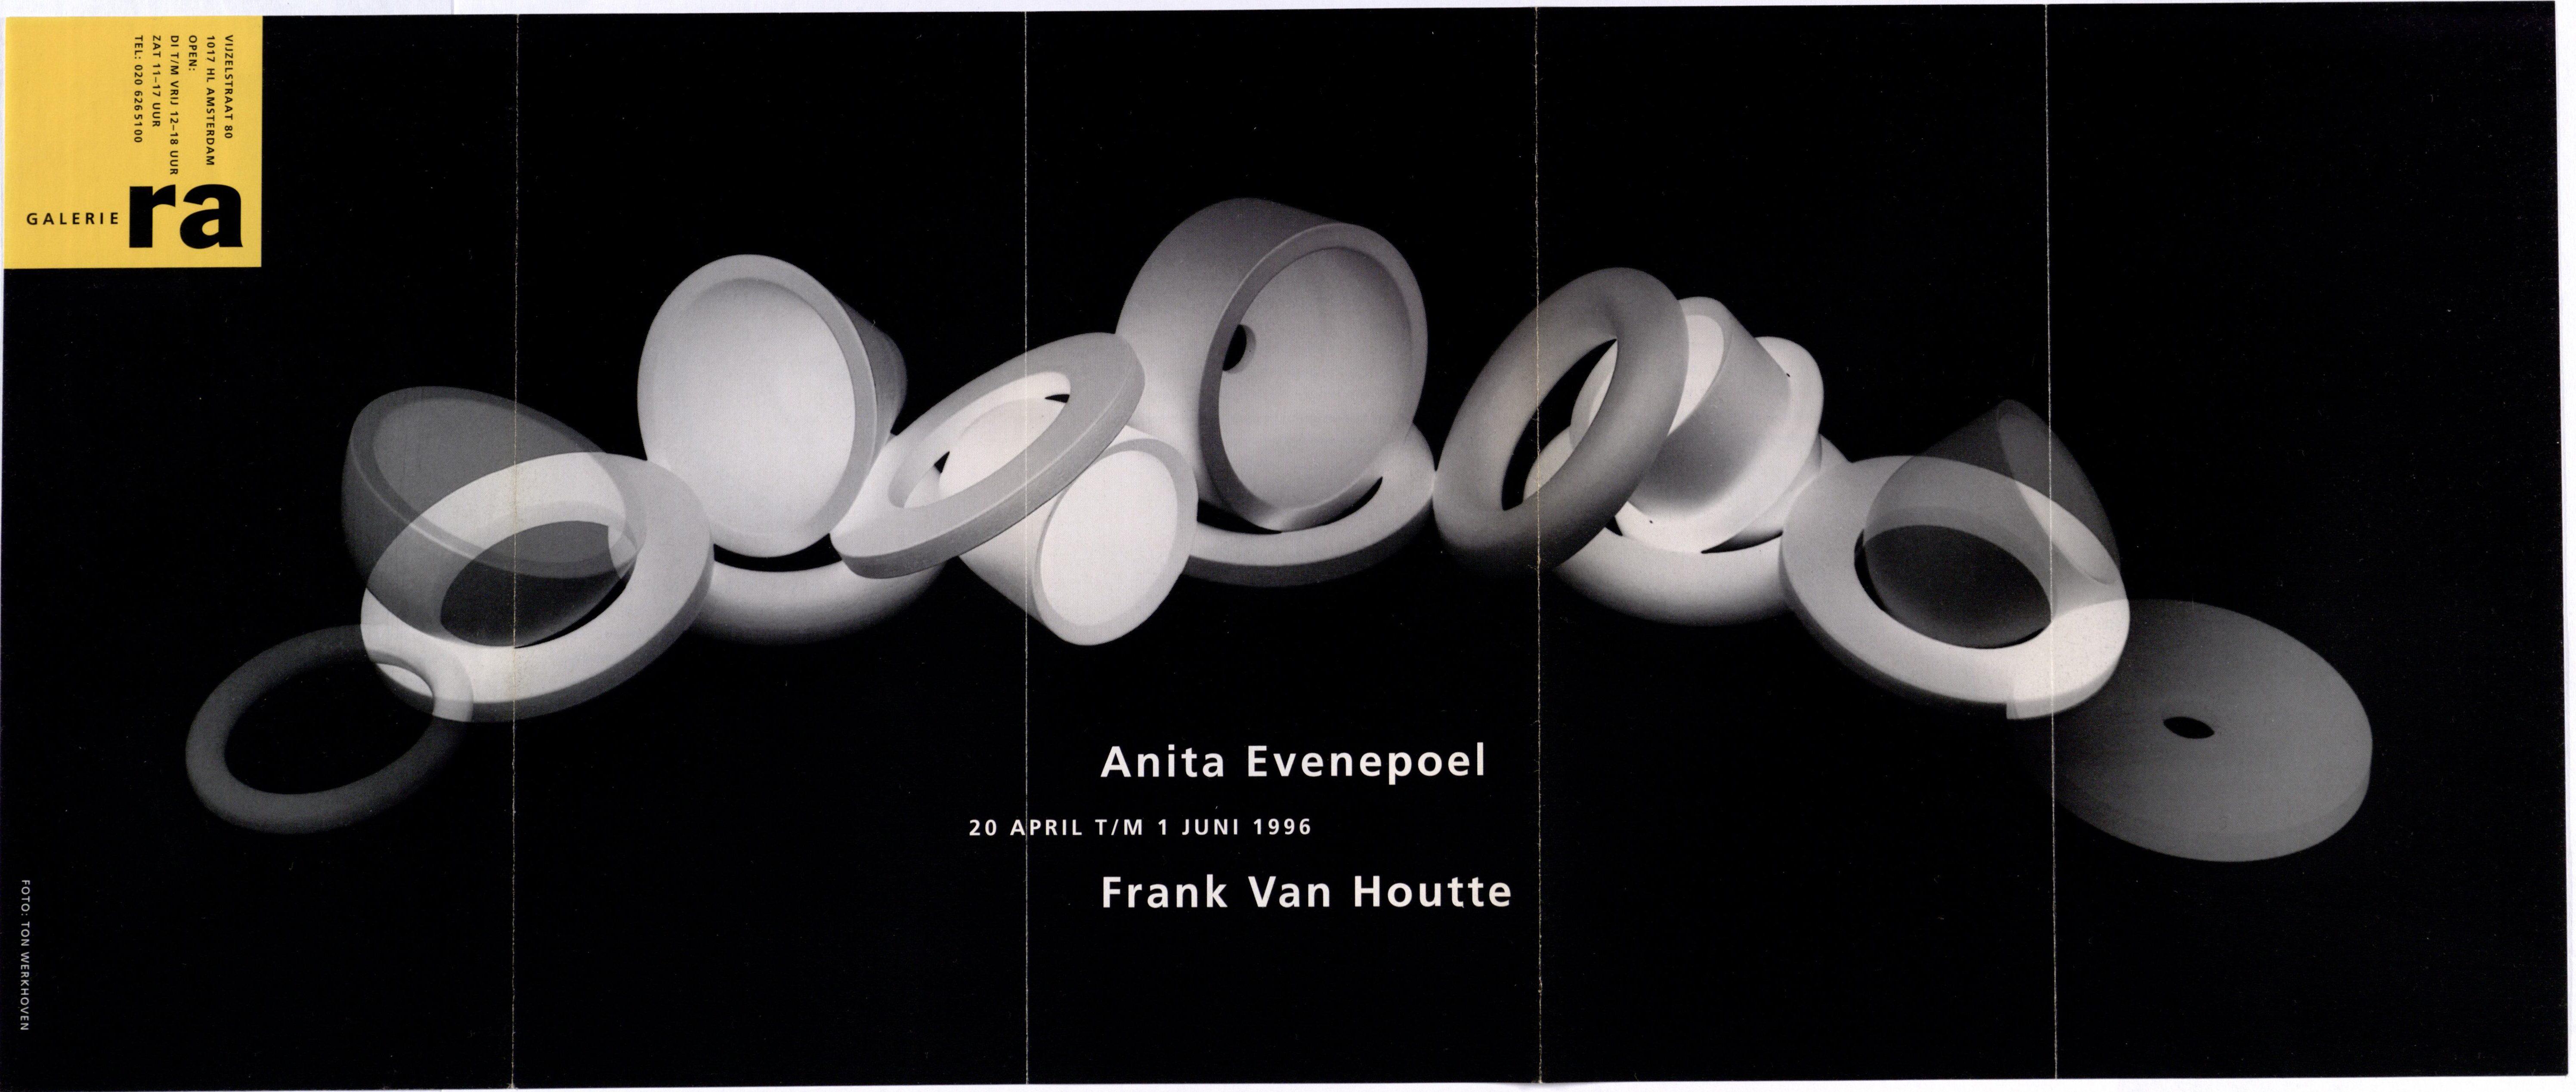 Ra Bulletin 96, april/mei 1996, voorzijde met foto van Ton Werkhoven met keramiek van Frank Van Houtte, drukwerk, papier